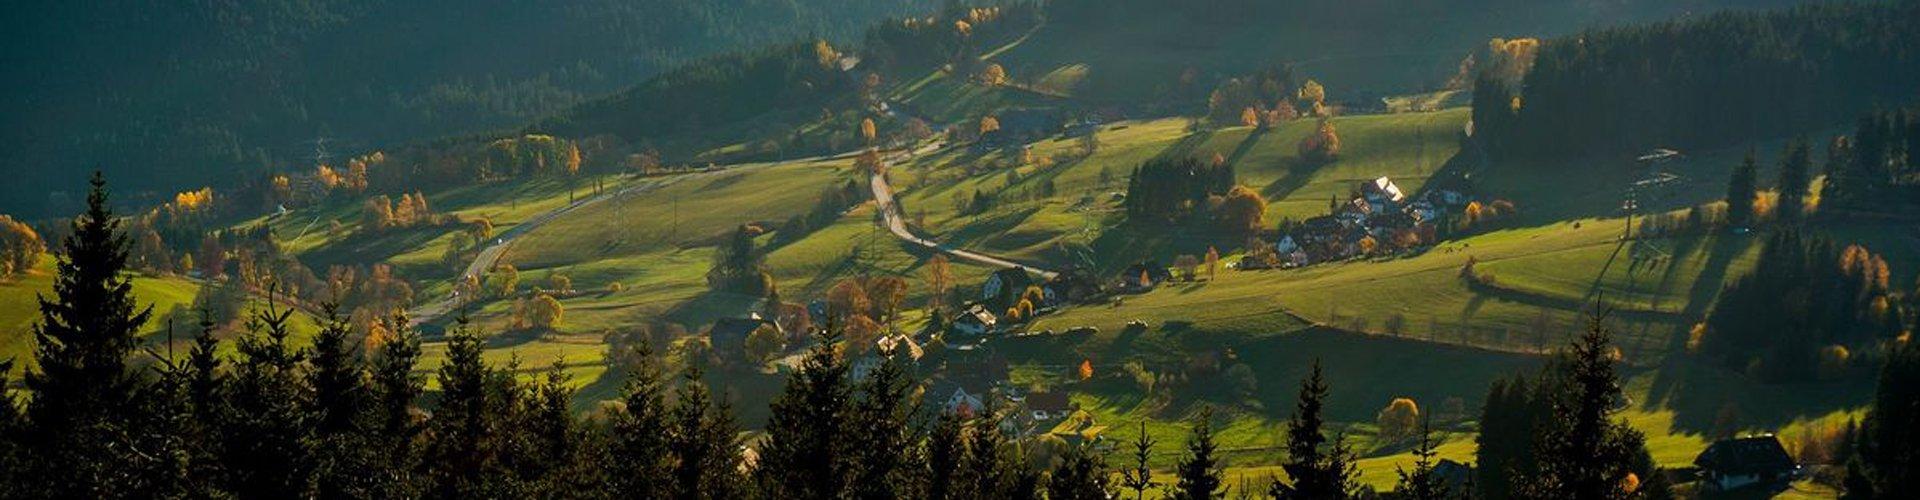 Hot4el Schwarzwald Freudenstadt